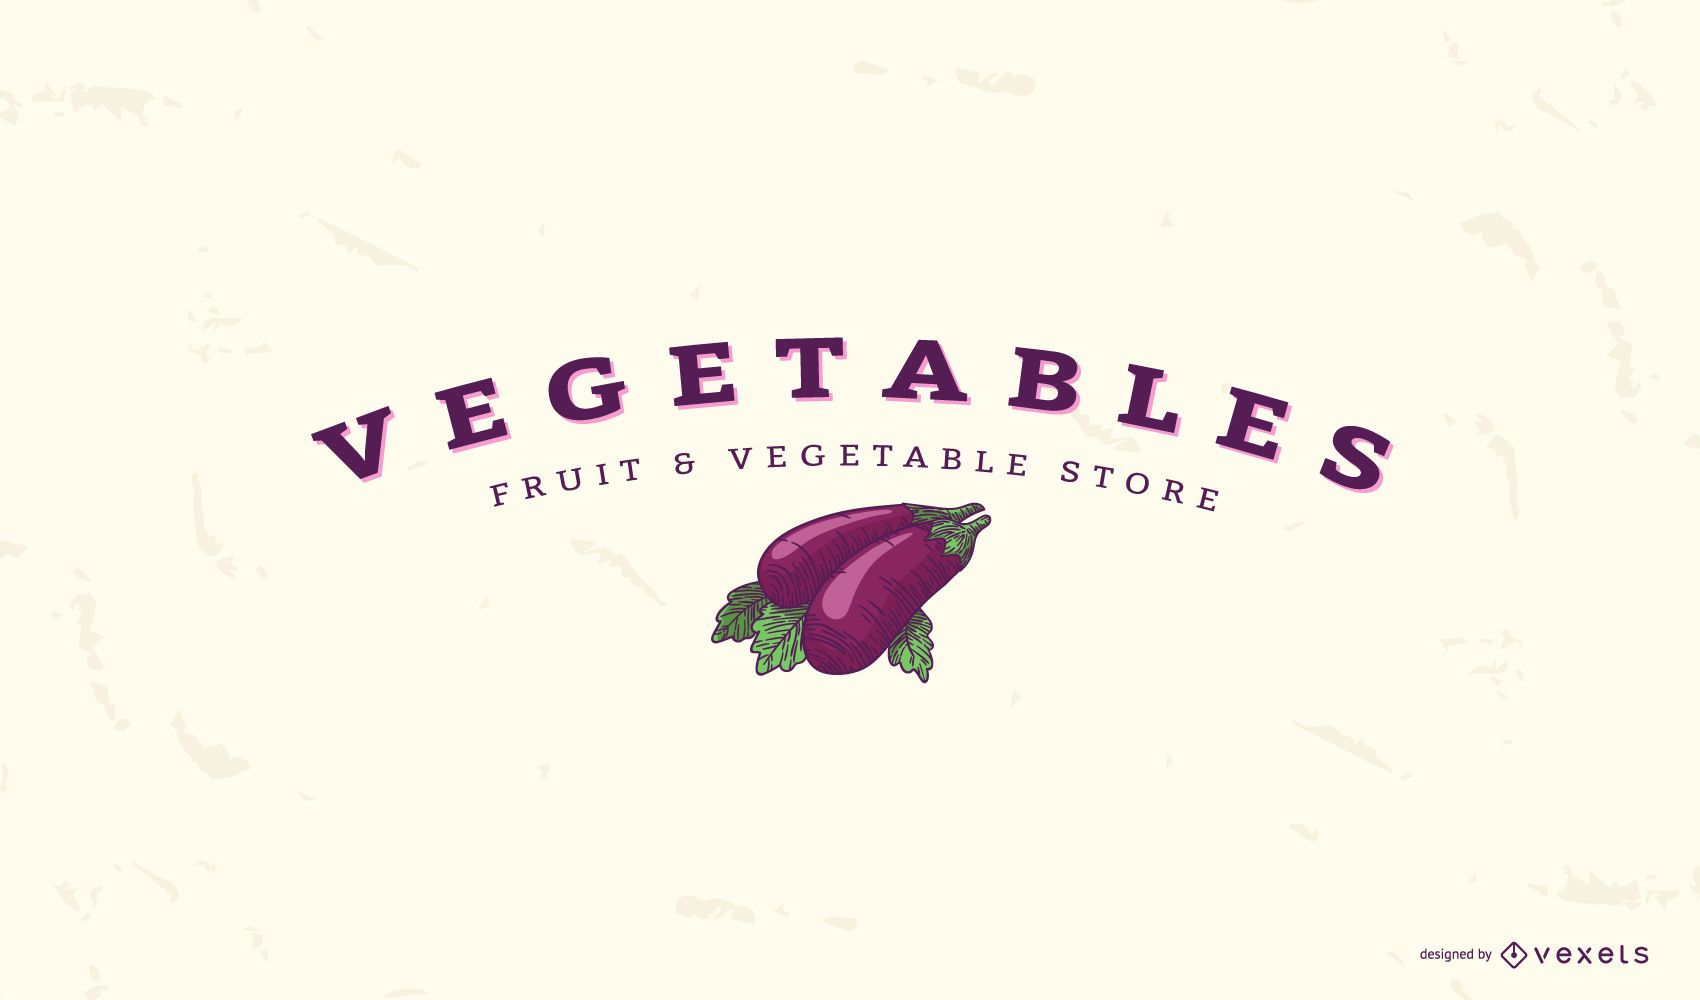 Eggplant vegetable logo template